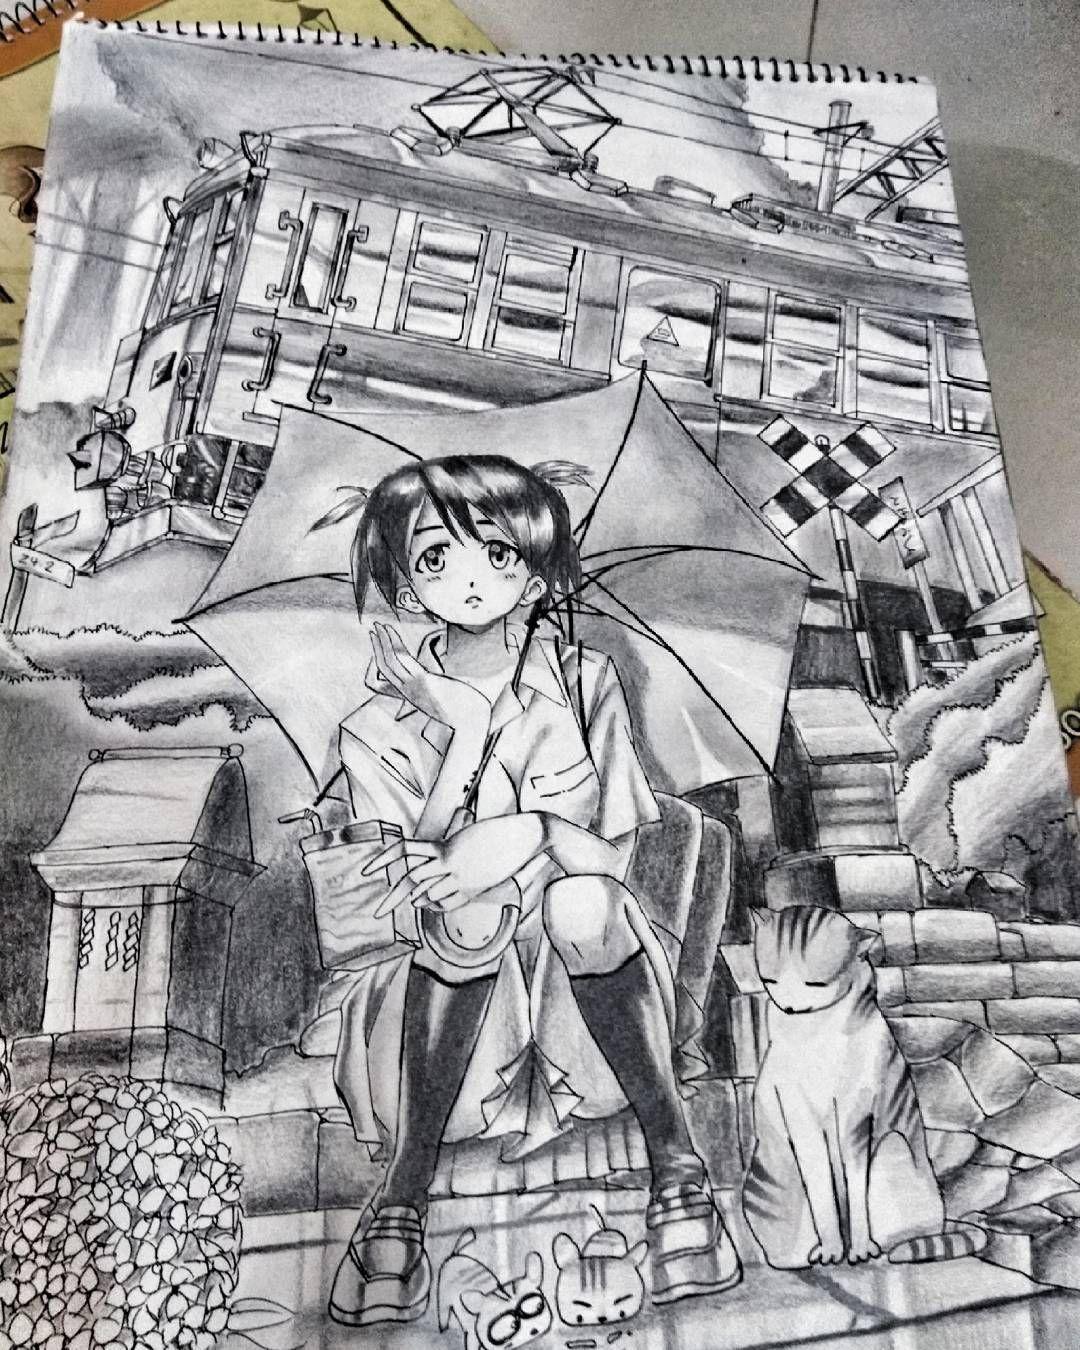 Waiting For The Rain Love Anime Manga Movie Japan Indian Mangartist Sketchbook Sketch Director Picoftheday Me I Anime Illustration Sketch Book